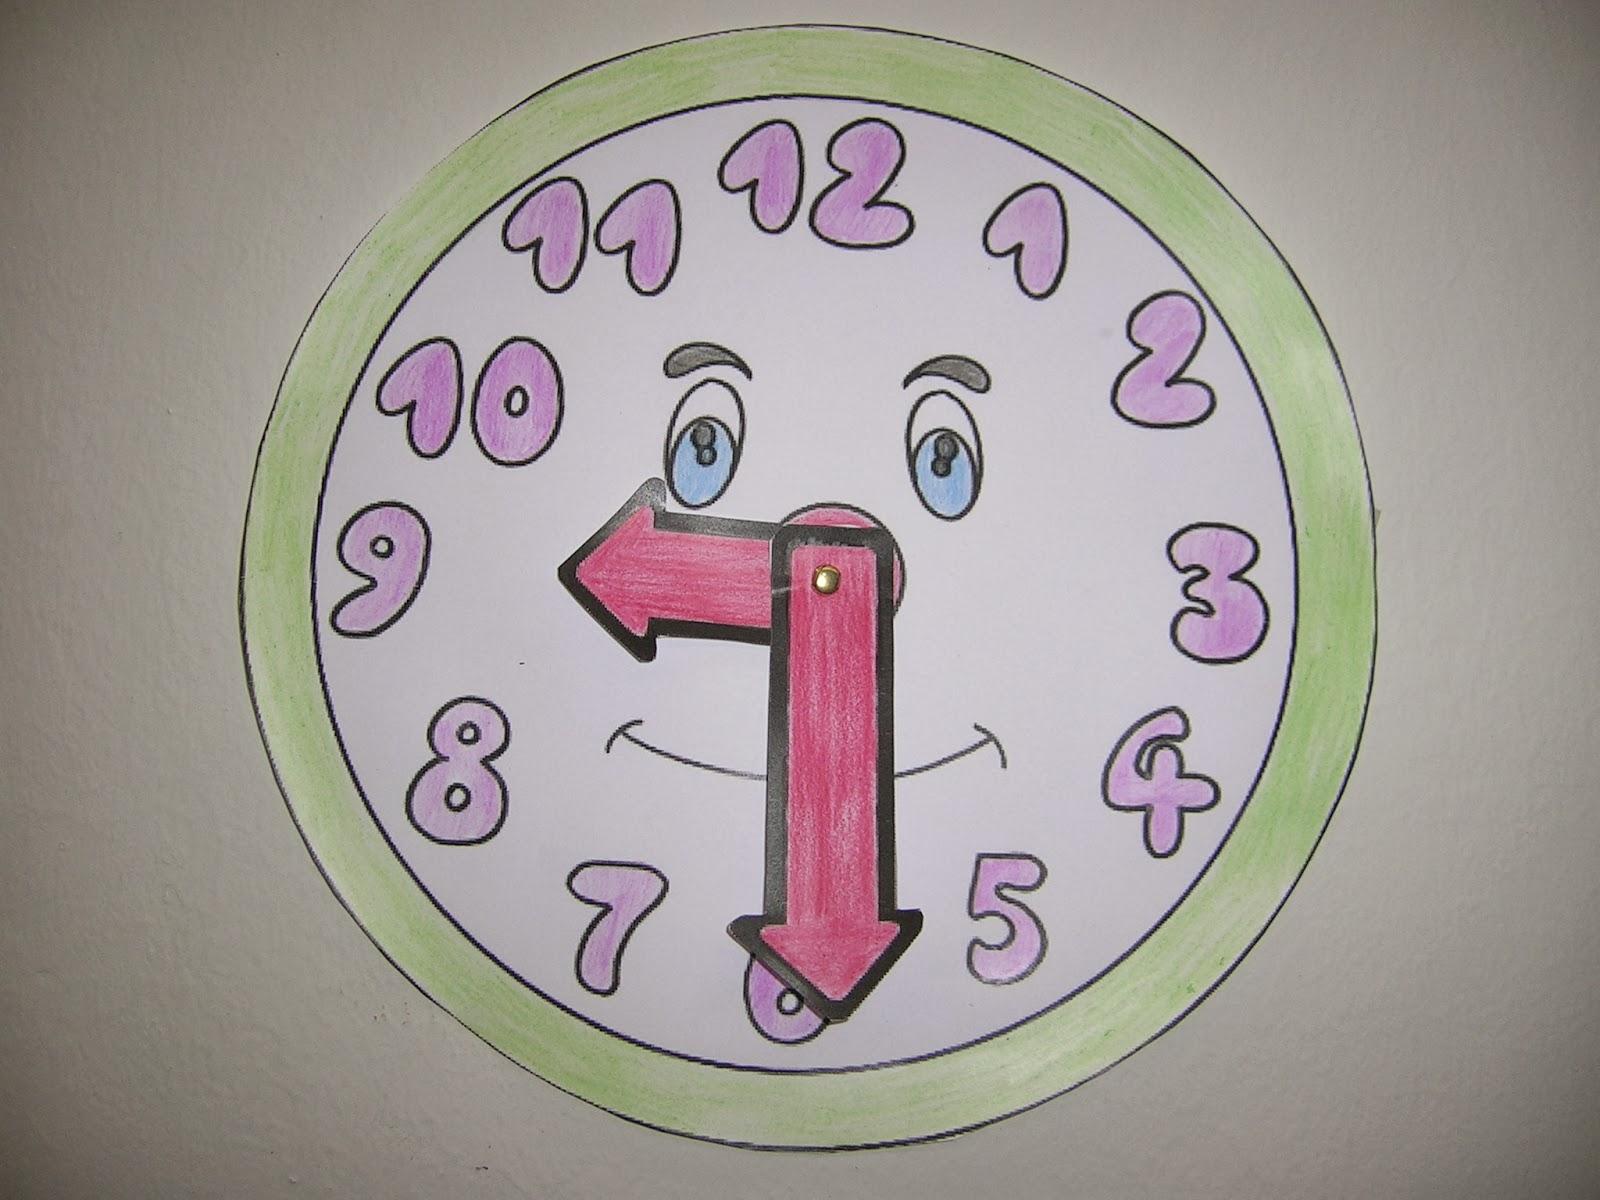 Trabajando en educaci n infantil las horas - Manualidades relojes infantiles ...